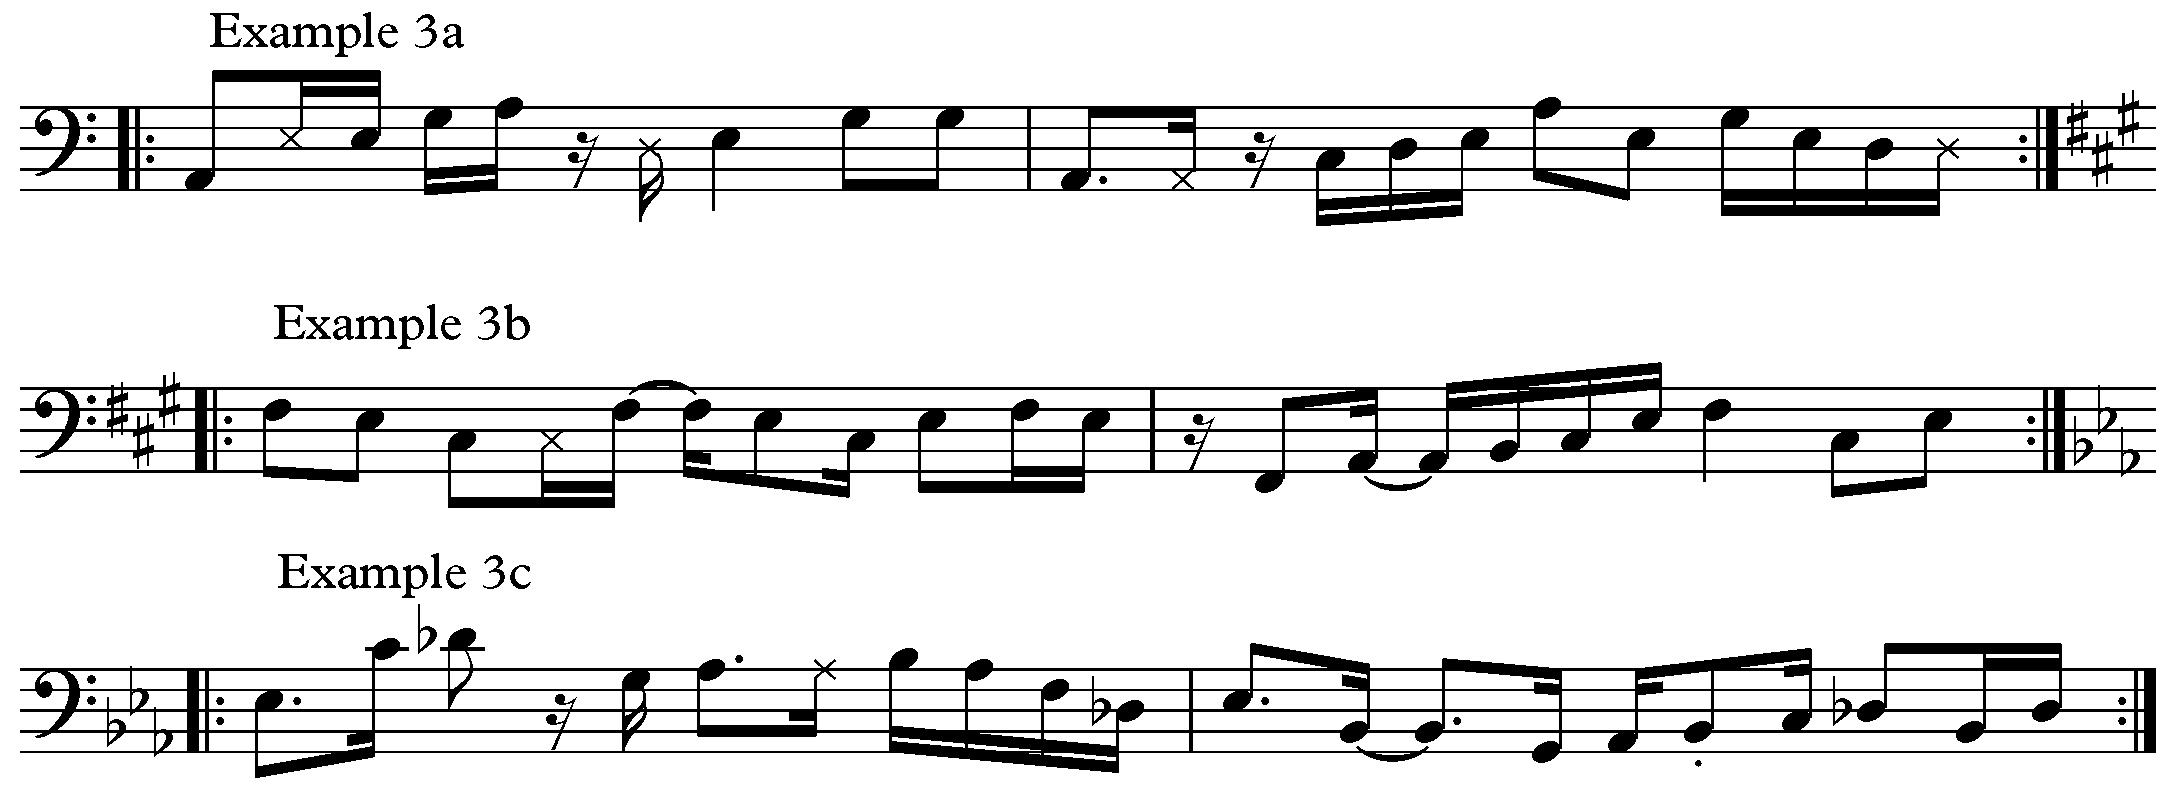 Bass clef sight reading exercises pdf